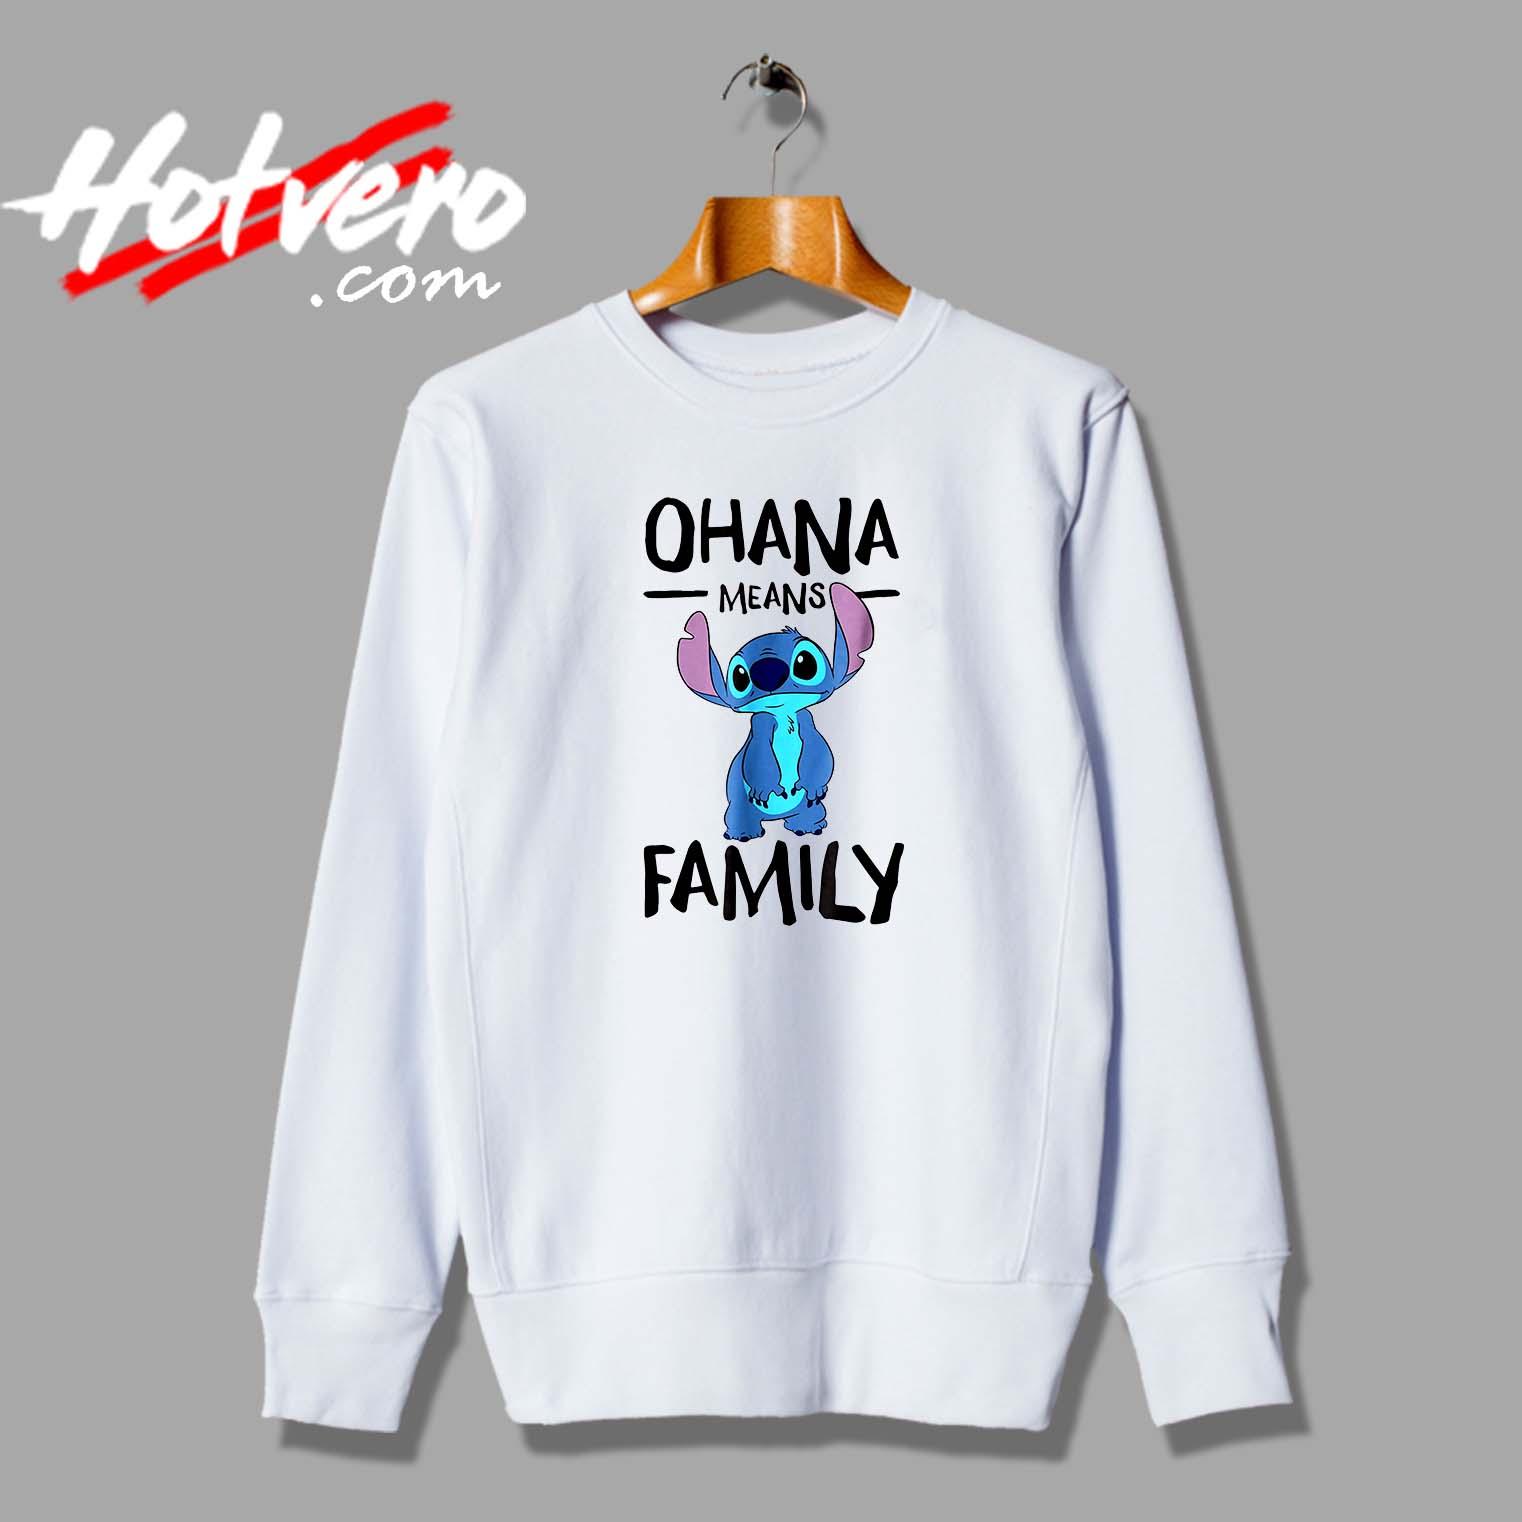 fb6a0e4bd Lillo Stitch Ohana Means Family Custom Sweatshirt - Hotvero